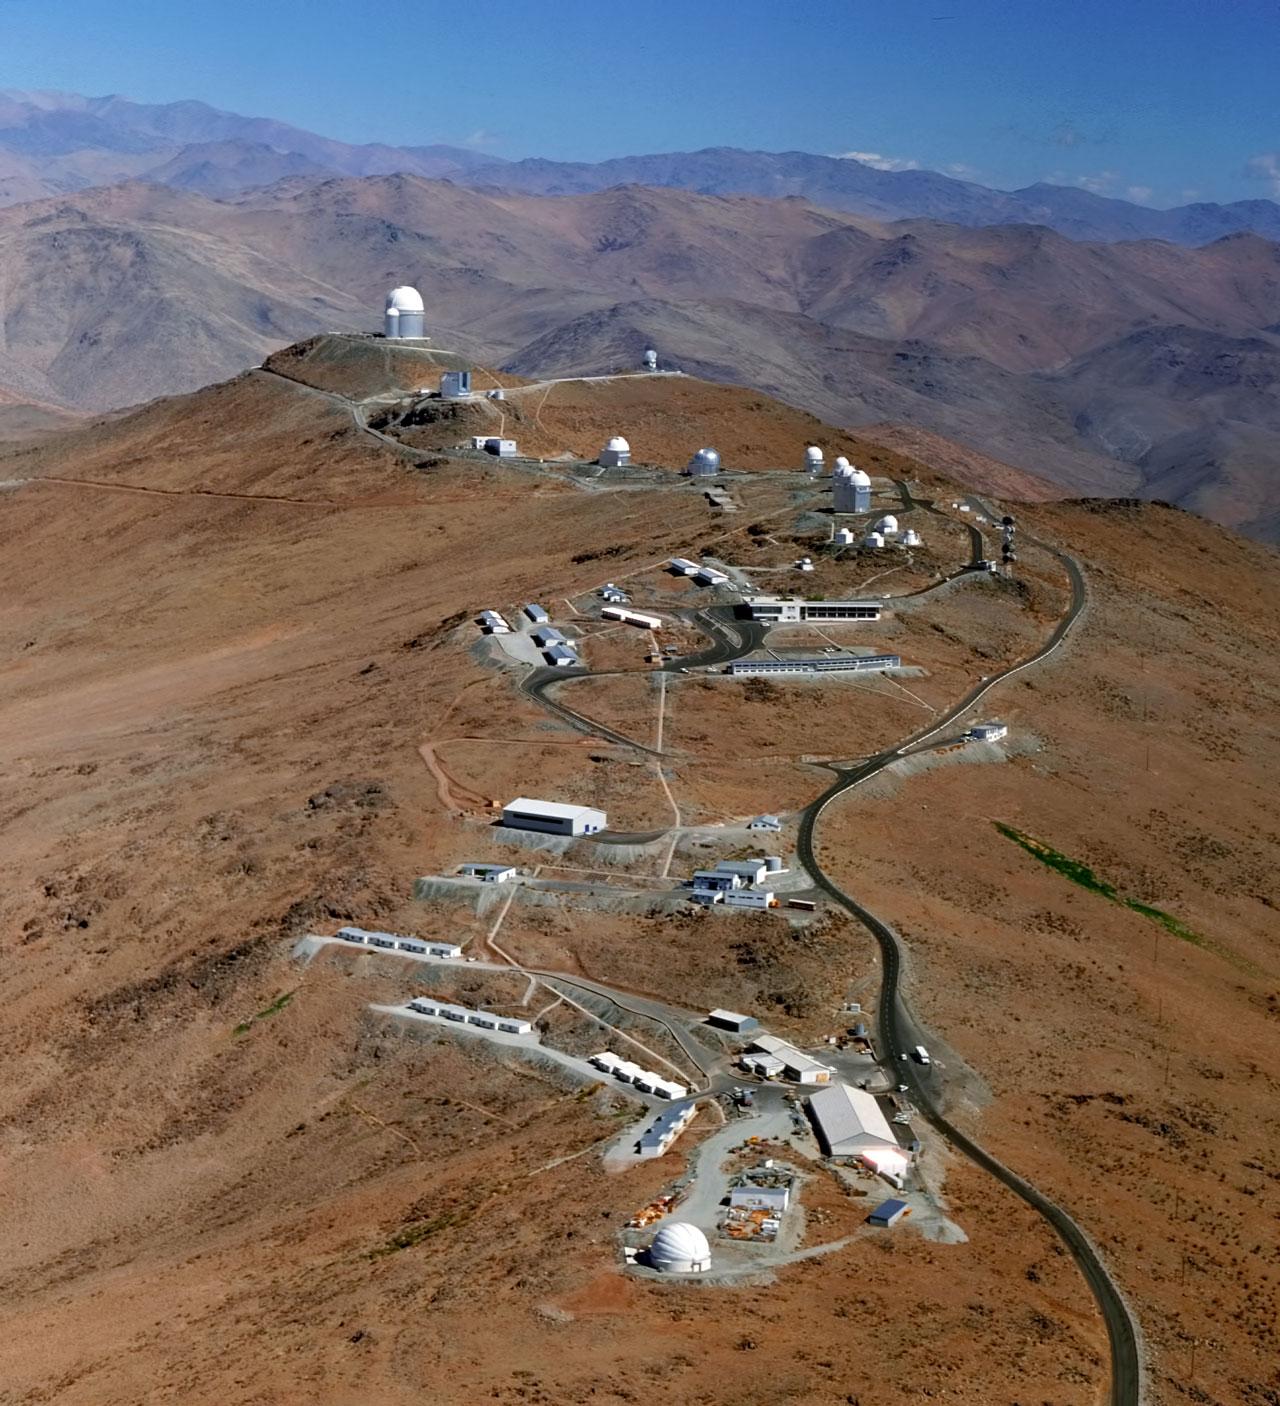 Aerial view of La Silla Observatory